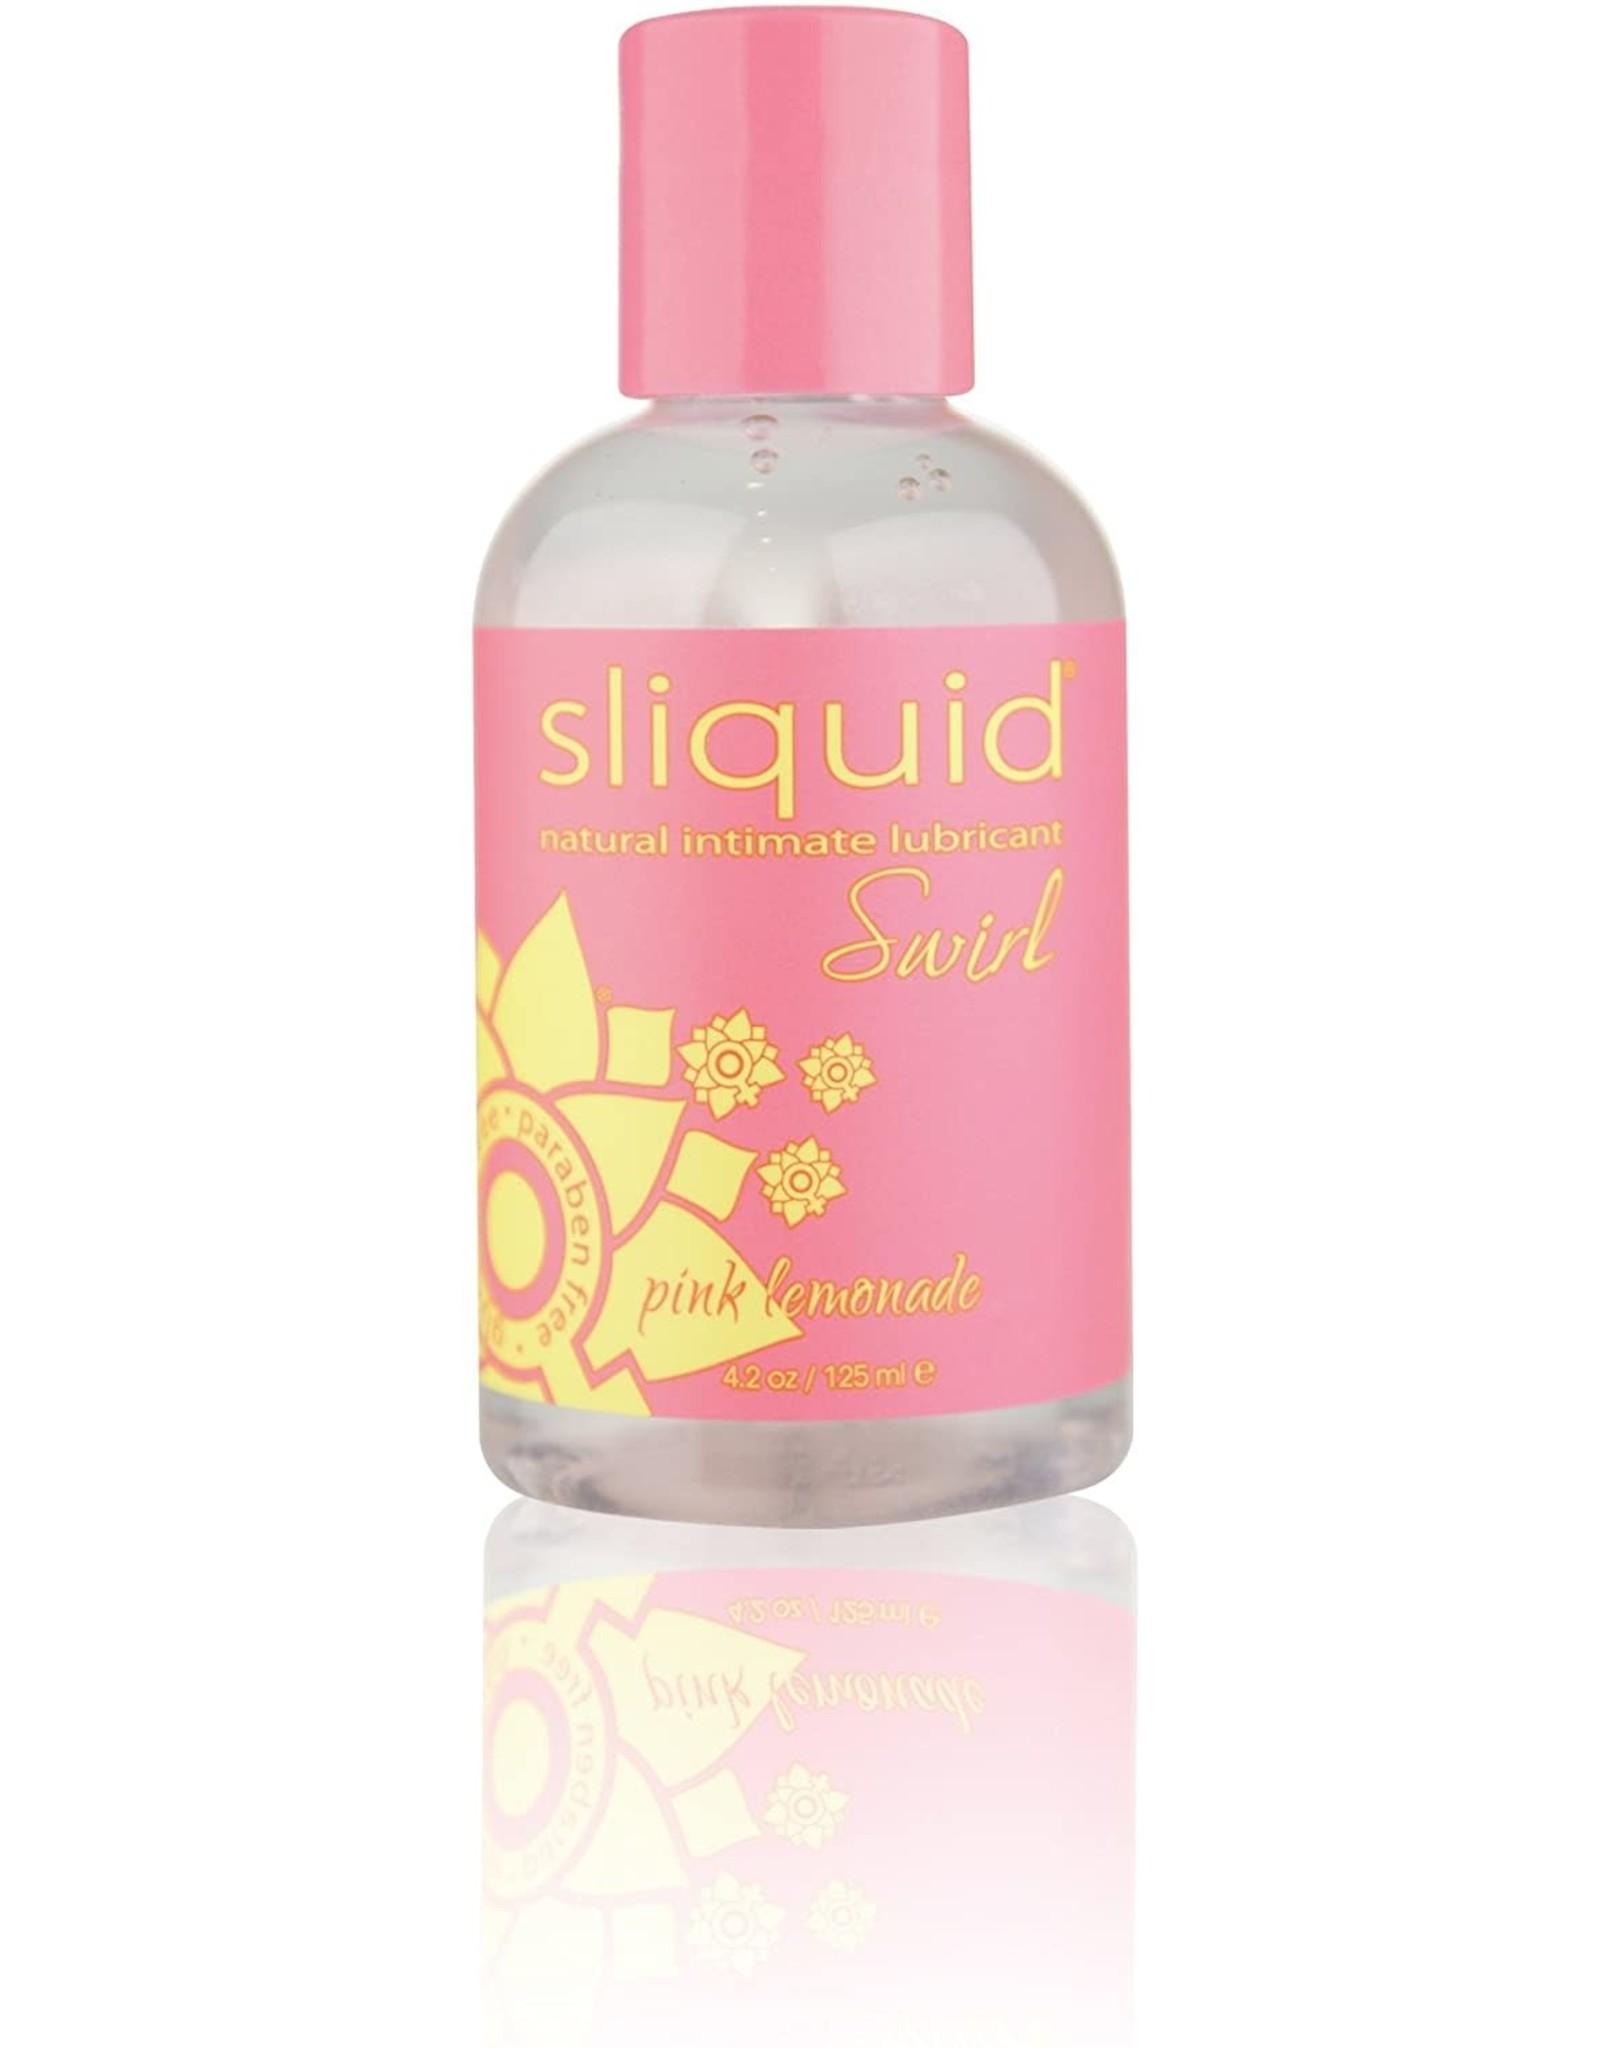 SLIQUID SLIQUID - SWIRL - PINK LEMONADE - 4.2 oz